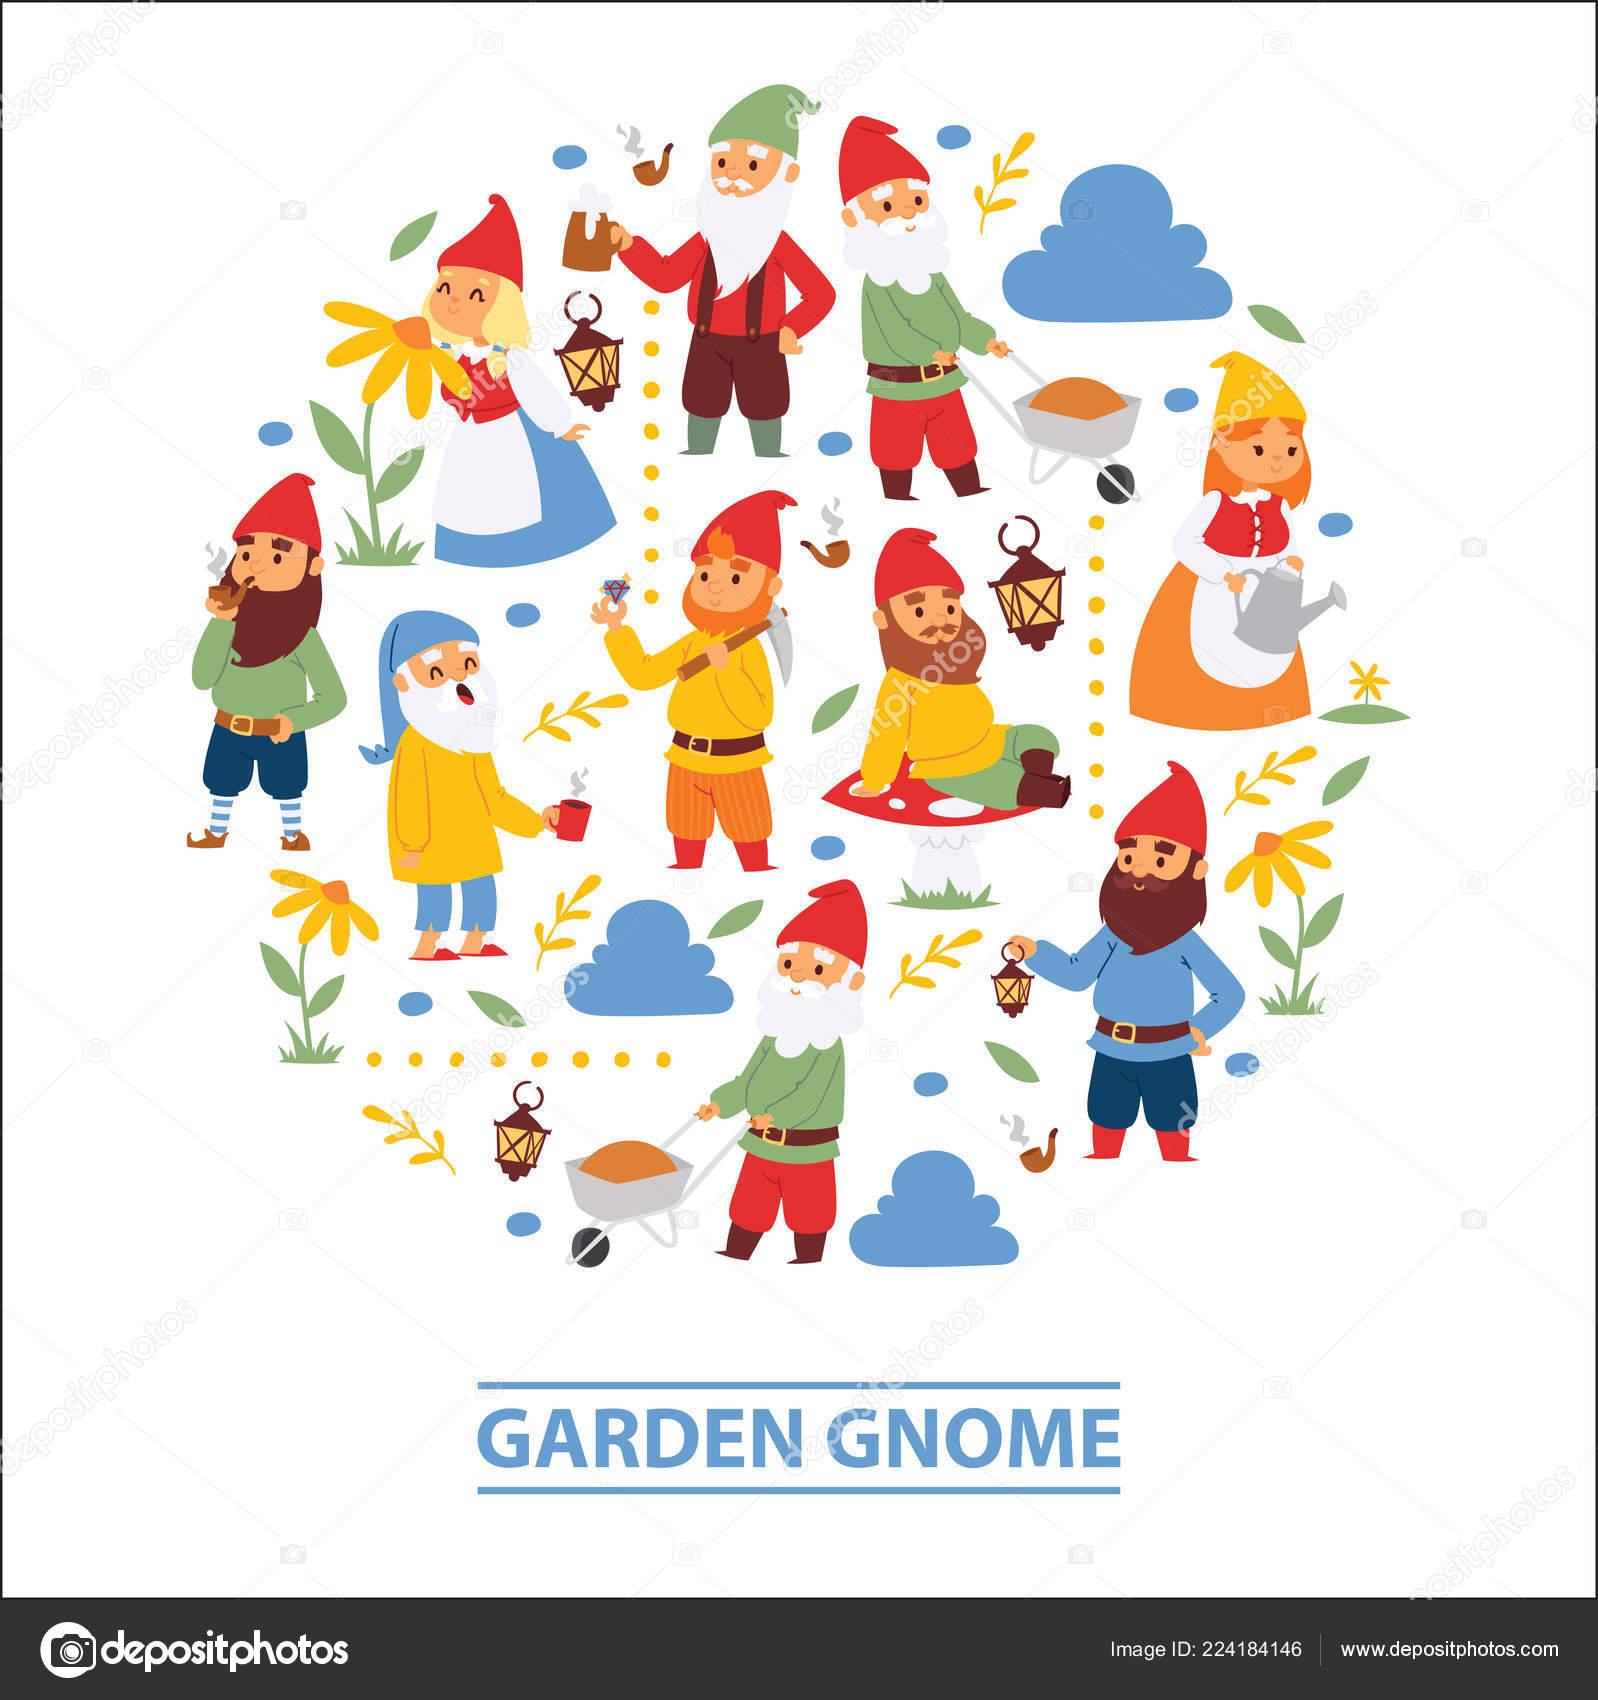 Fond d\'écran du personnages nains barbe nain de jardin et ...